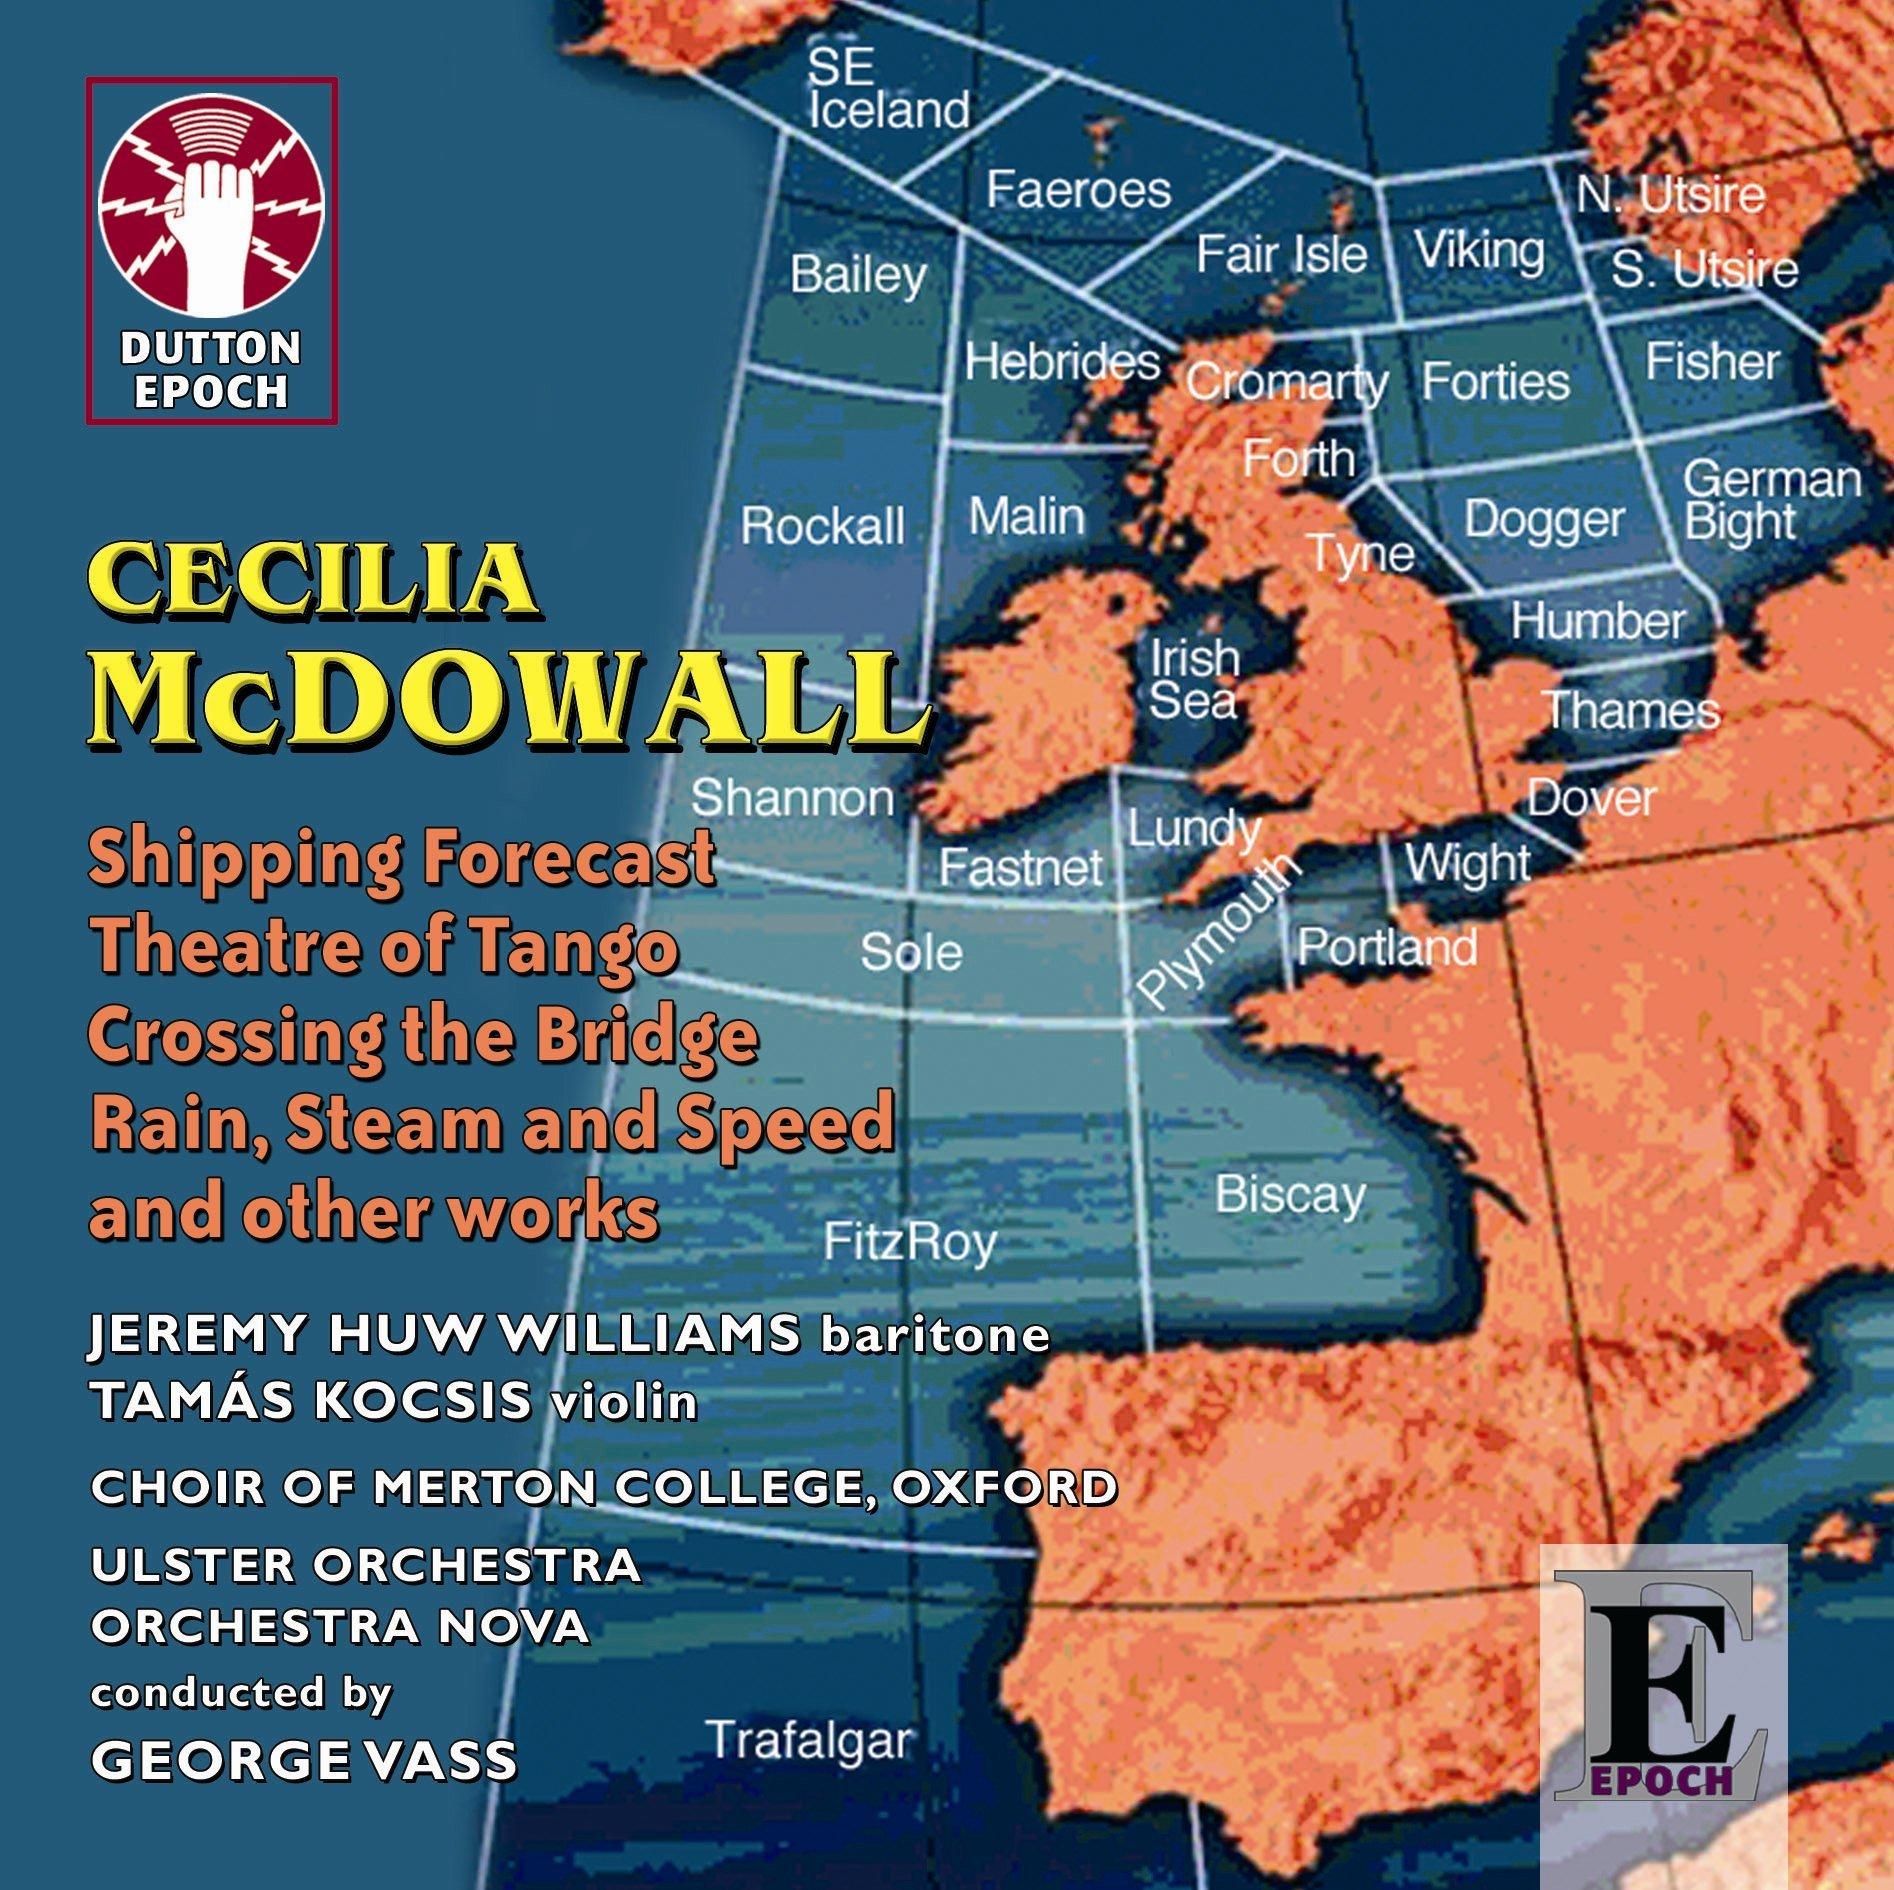 Cecilia McDowall - Shipping Forecast; Theatre of Tango; Crossing the Bridge; Rain, Steam and Speed etc